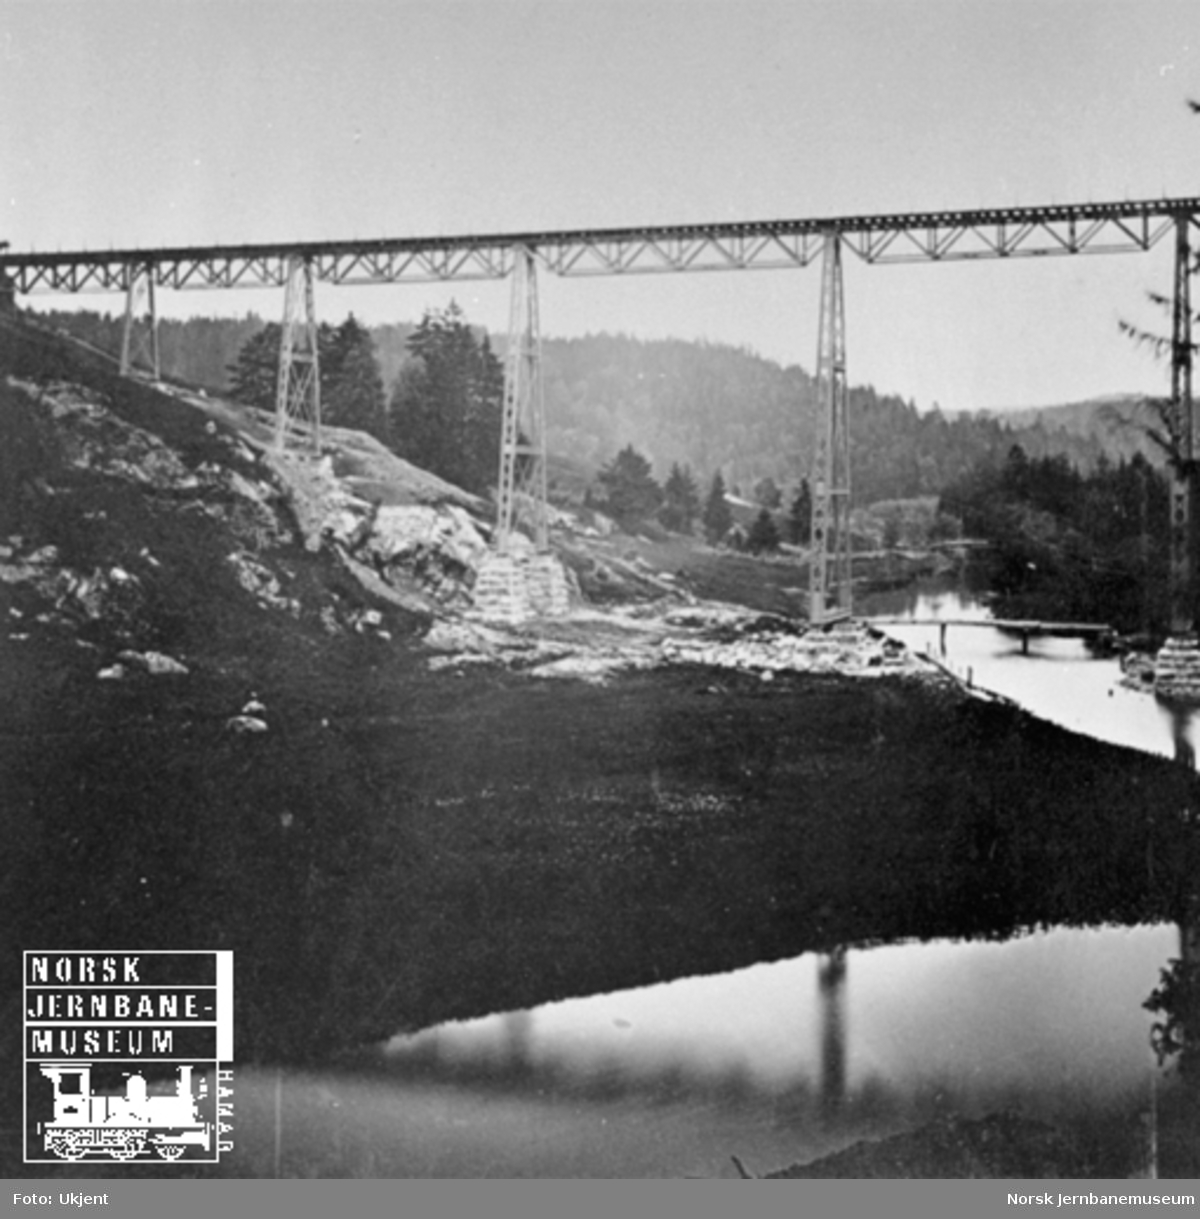 Hobøl viadukt